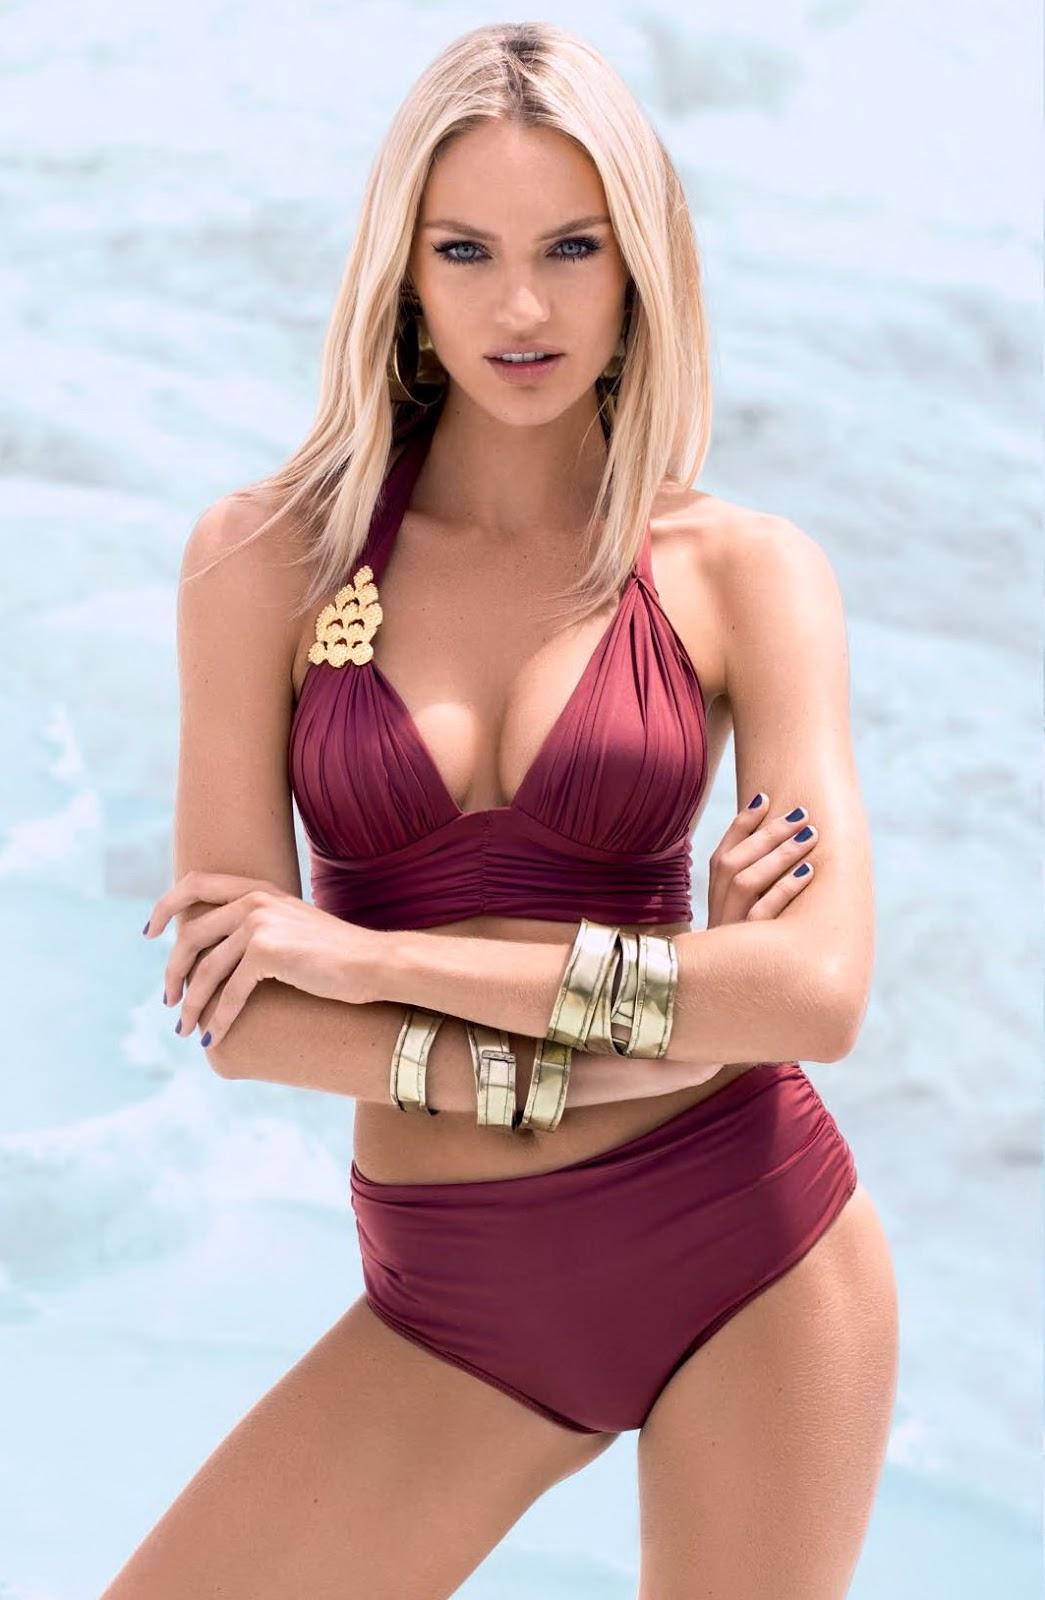 http://4.bp.blogspot.com/-OBAjZM8V8fc/UDioFrMOfiI/AAAAAAAANRY/RgCkA3BpPc8/s1600/Candice+Swanepoel+models+Agua+de+Coco+Swimwear+2013+collection.jpg